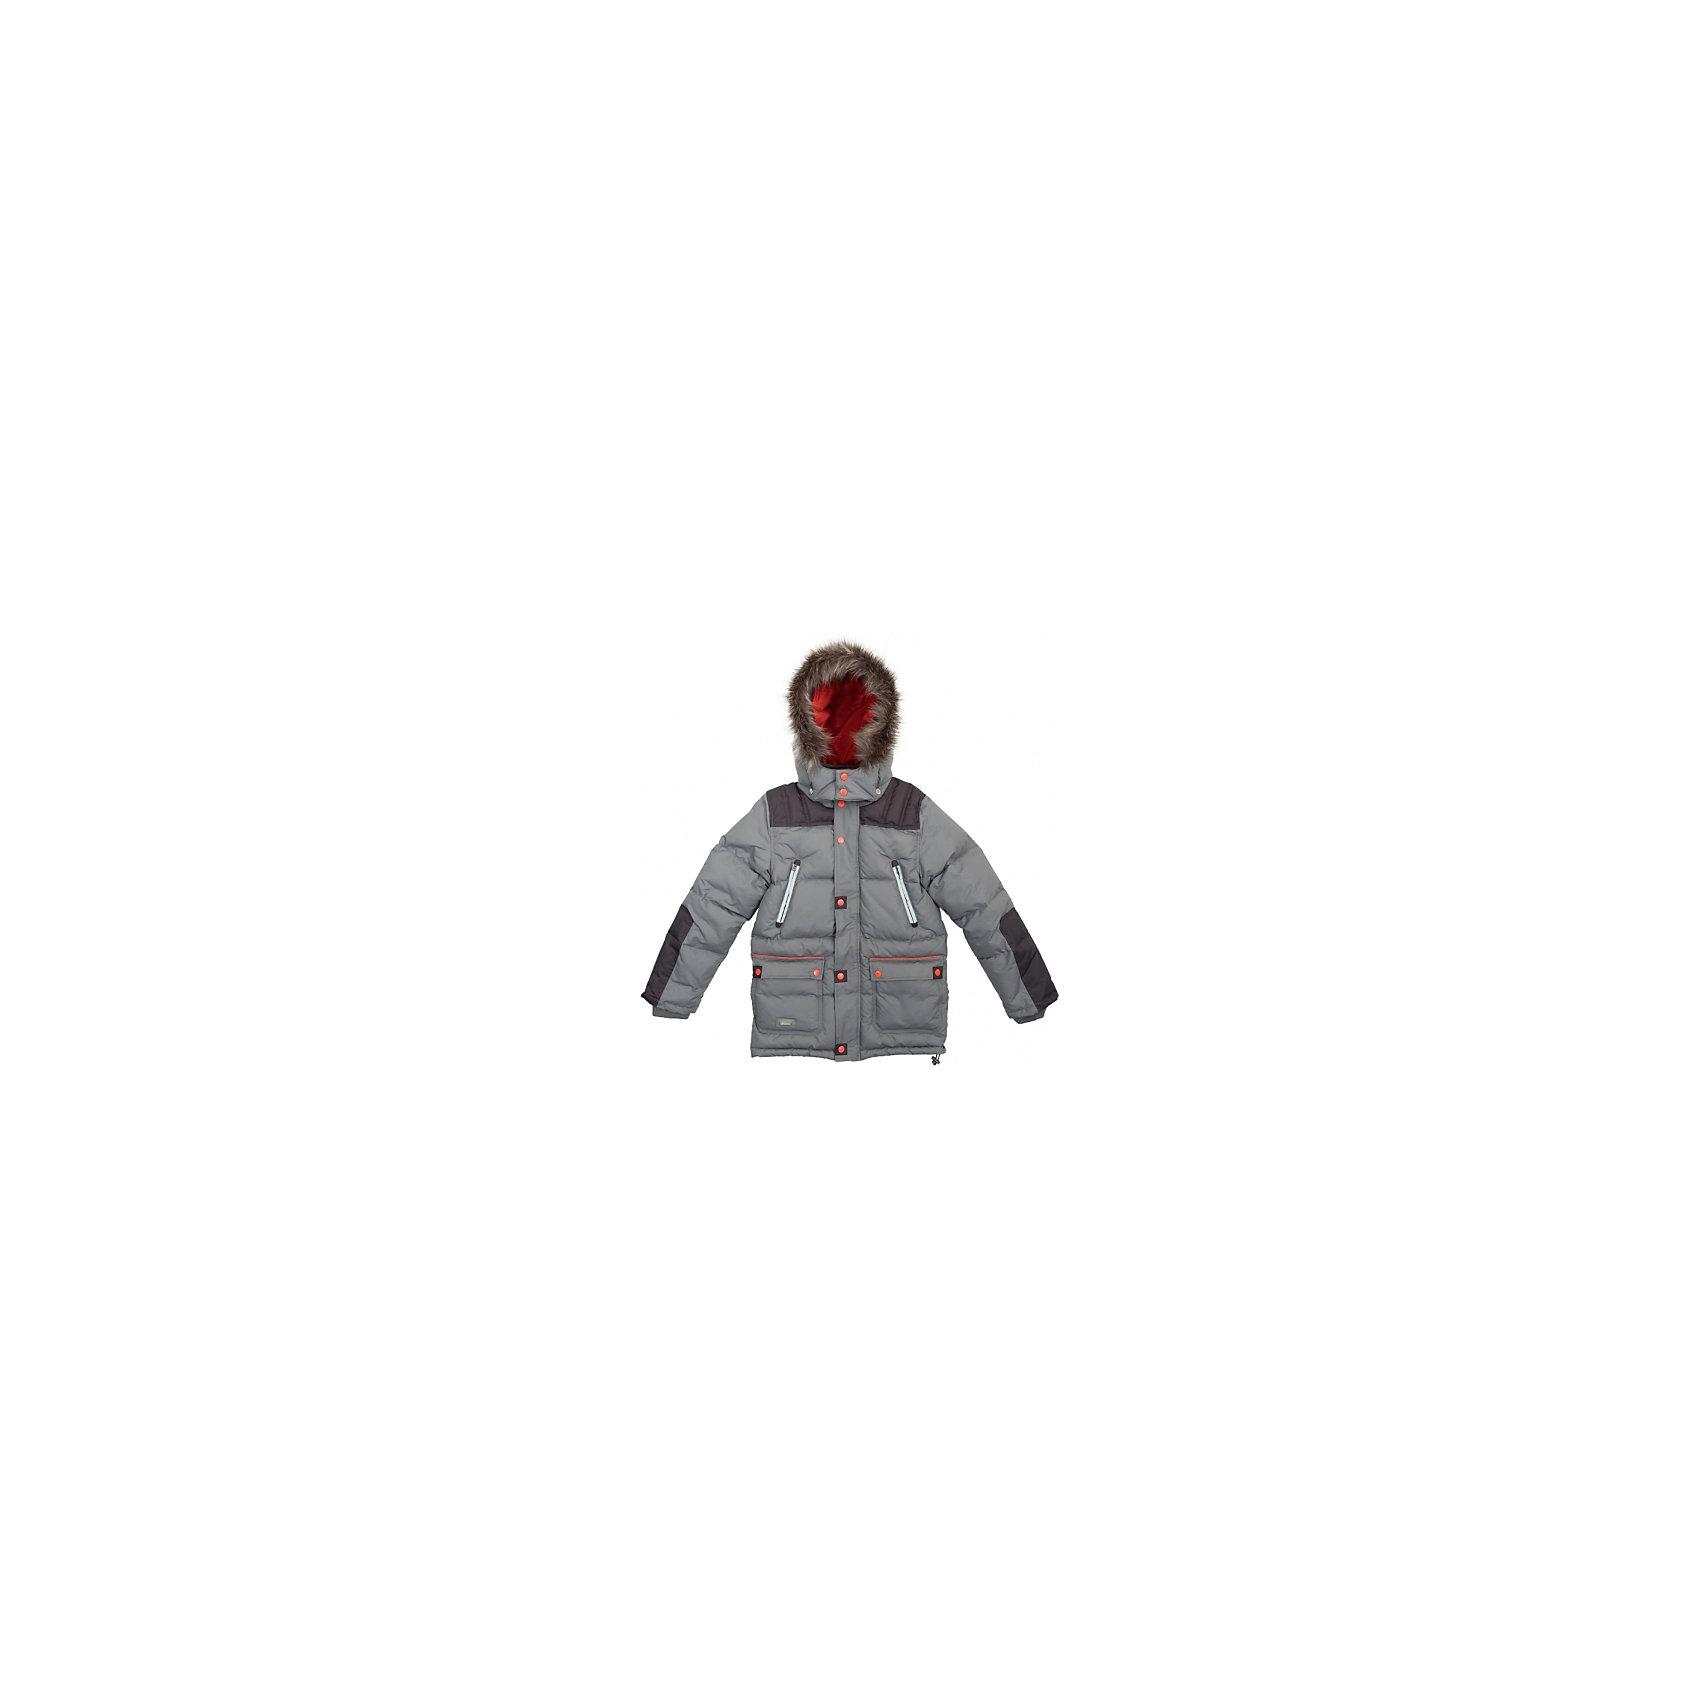 S'cool Куртка для мальчика S'cool trybeyond куртка для мальчика 999 97499 00 94z серый trybeyond